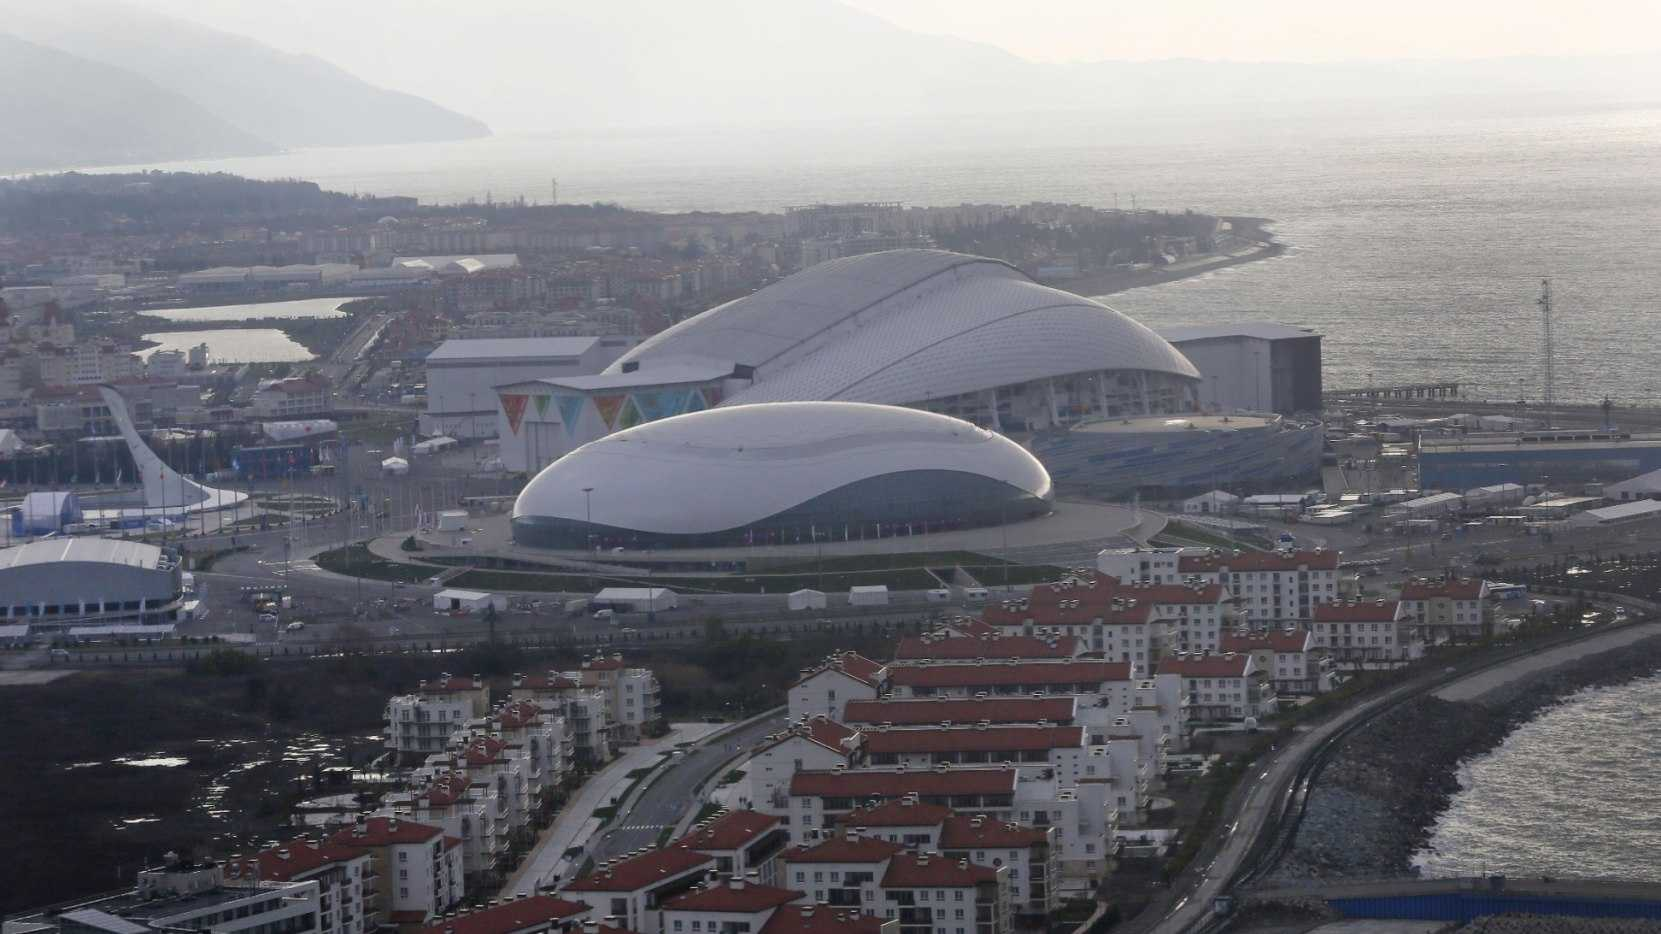 Sochi Aerial Photo 0207.jpg